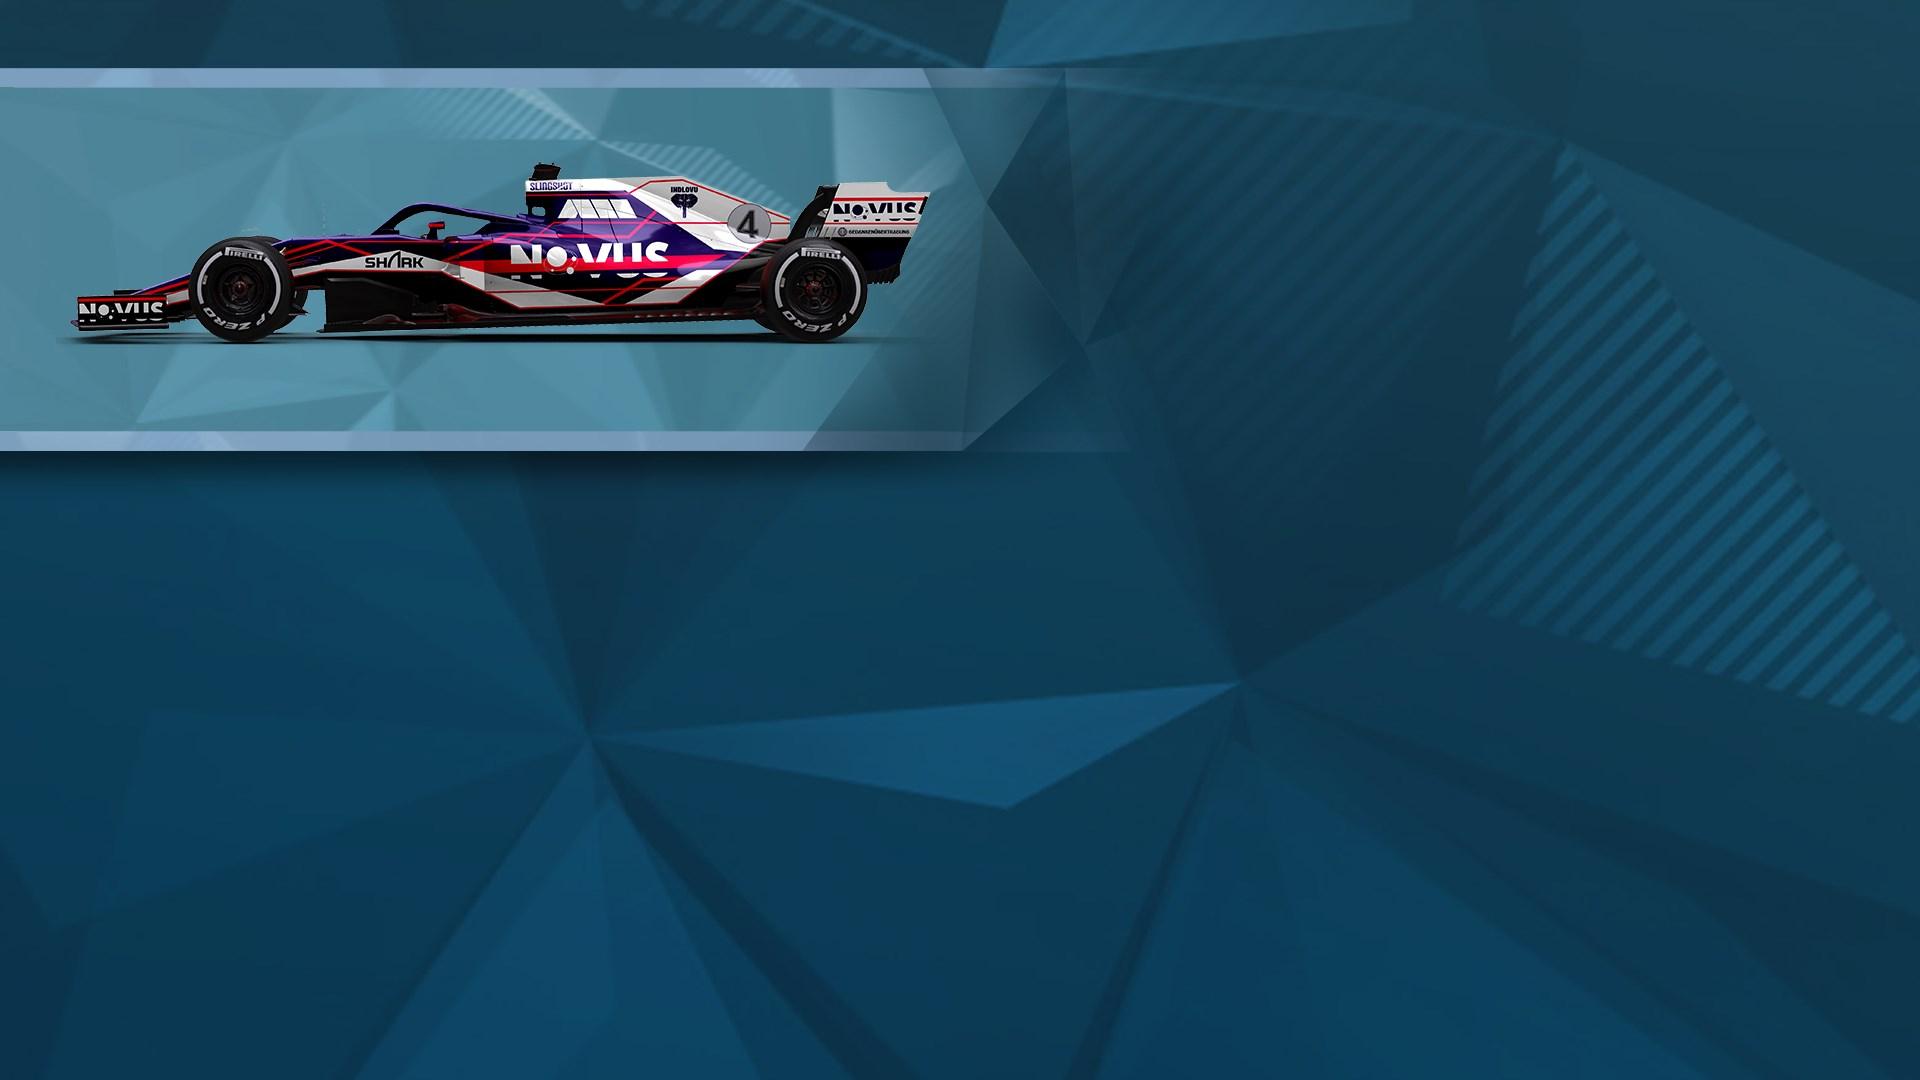 Buy F1 2019 Car Livery NOVUS   Datastream   Microsoft Store en 1920x1080